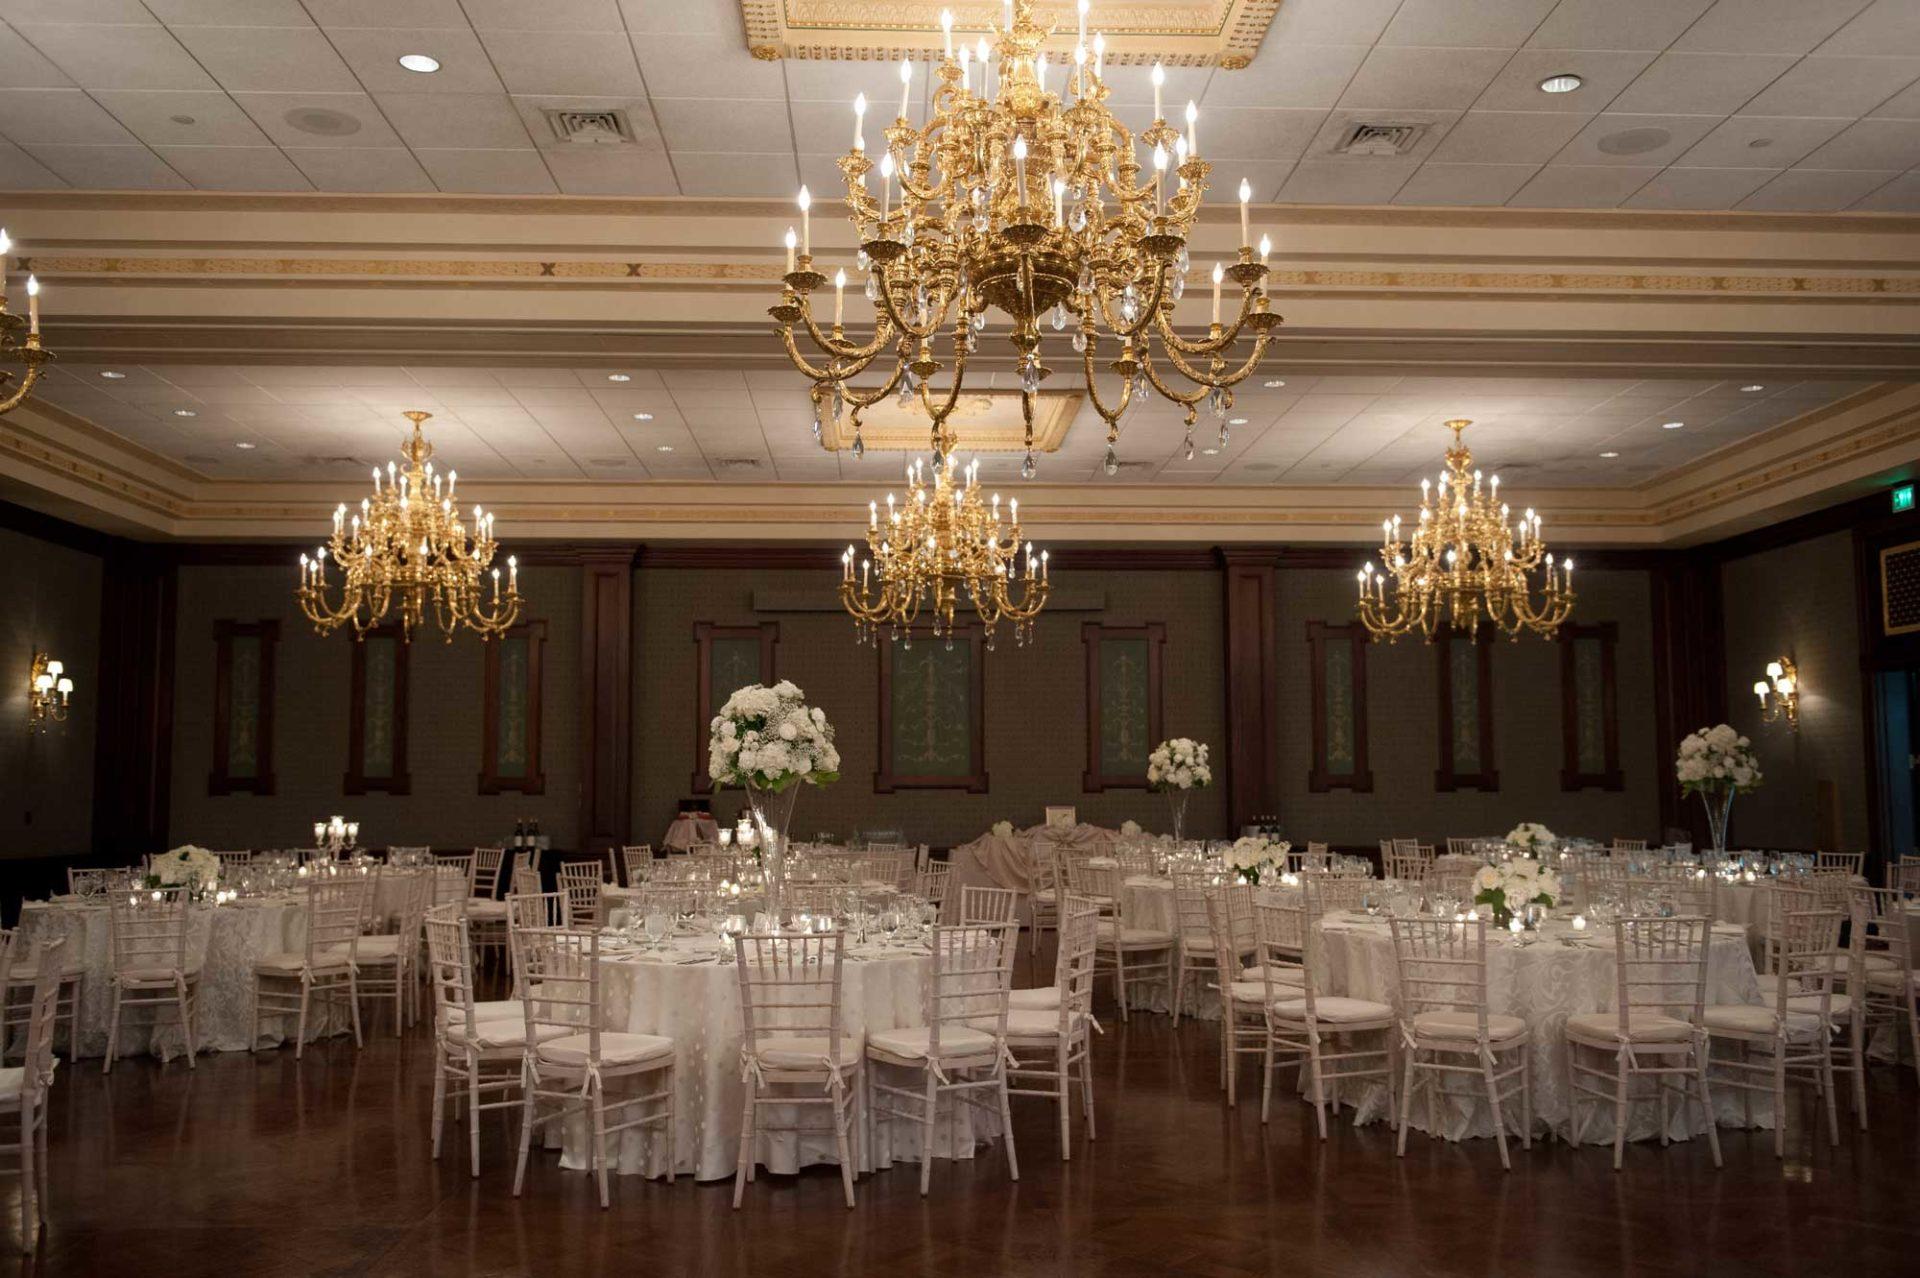 Decor baltimore catering washington dc caterer weddings find us on facebook junglespirit Images